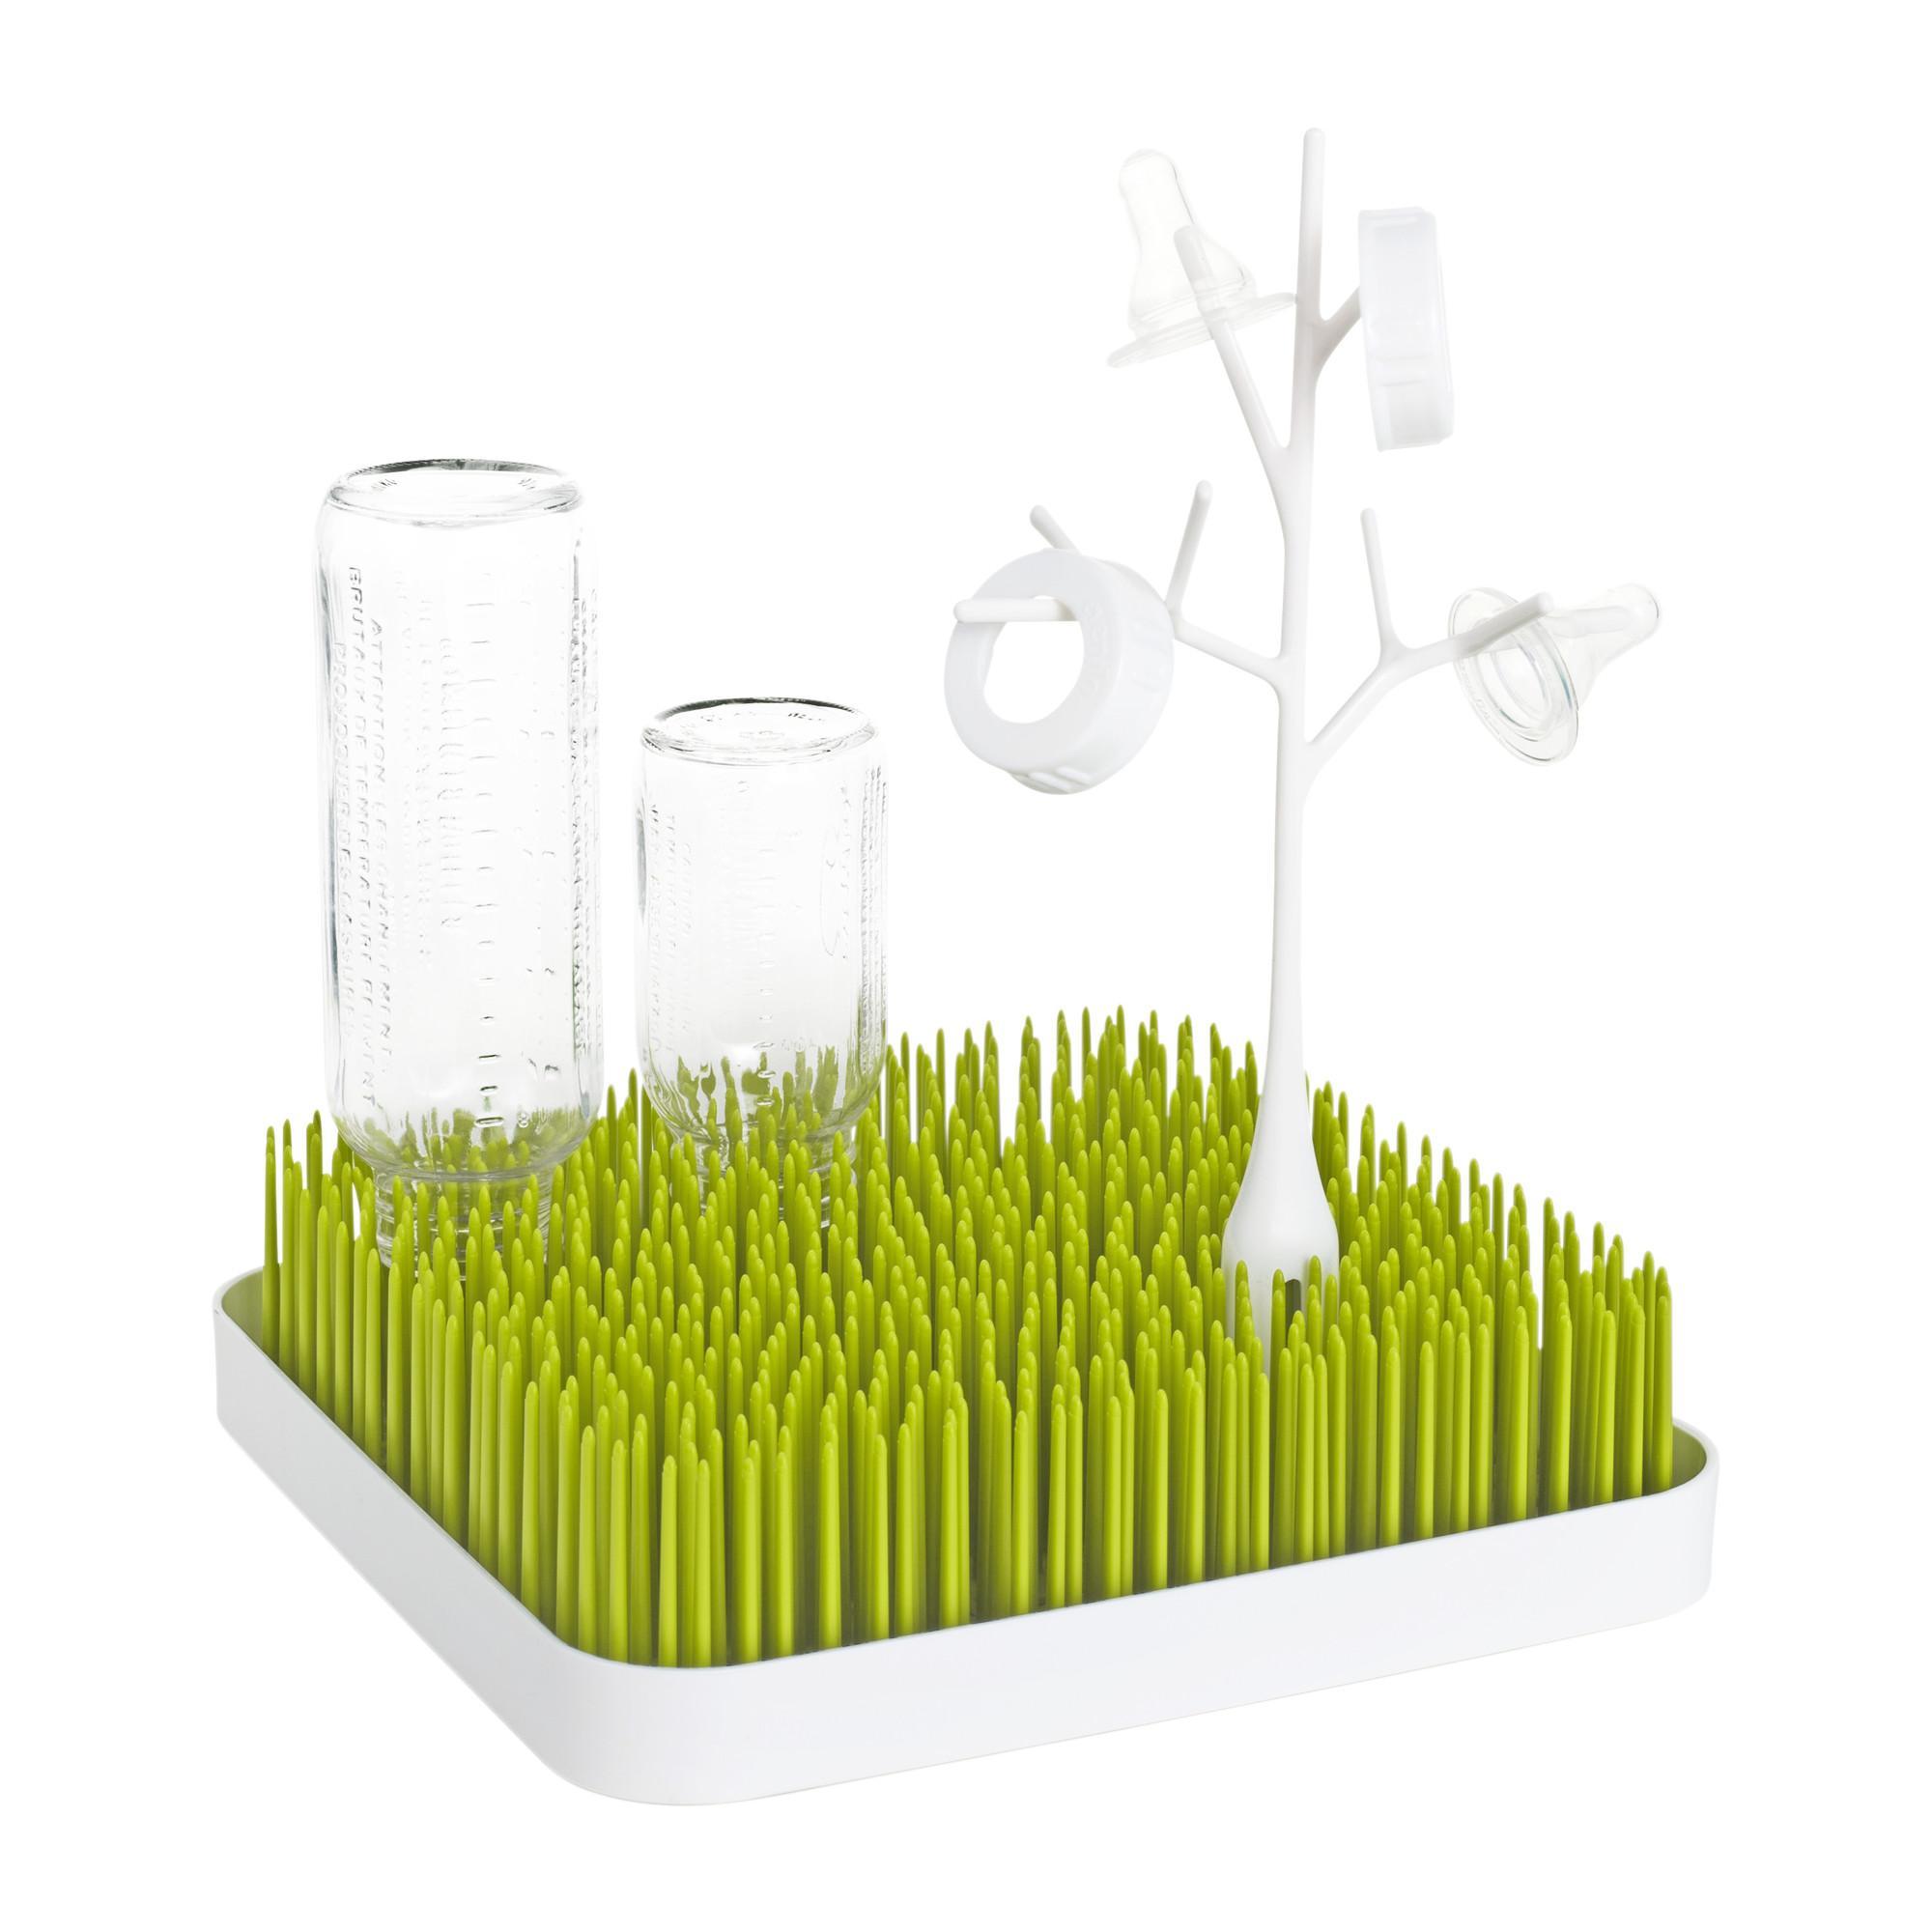 Amazon.com: Boon Grass Countertop Drying Rack,Green: Ann